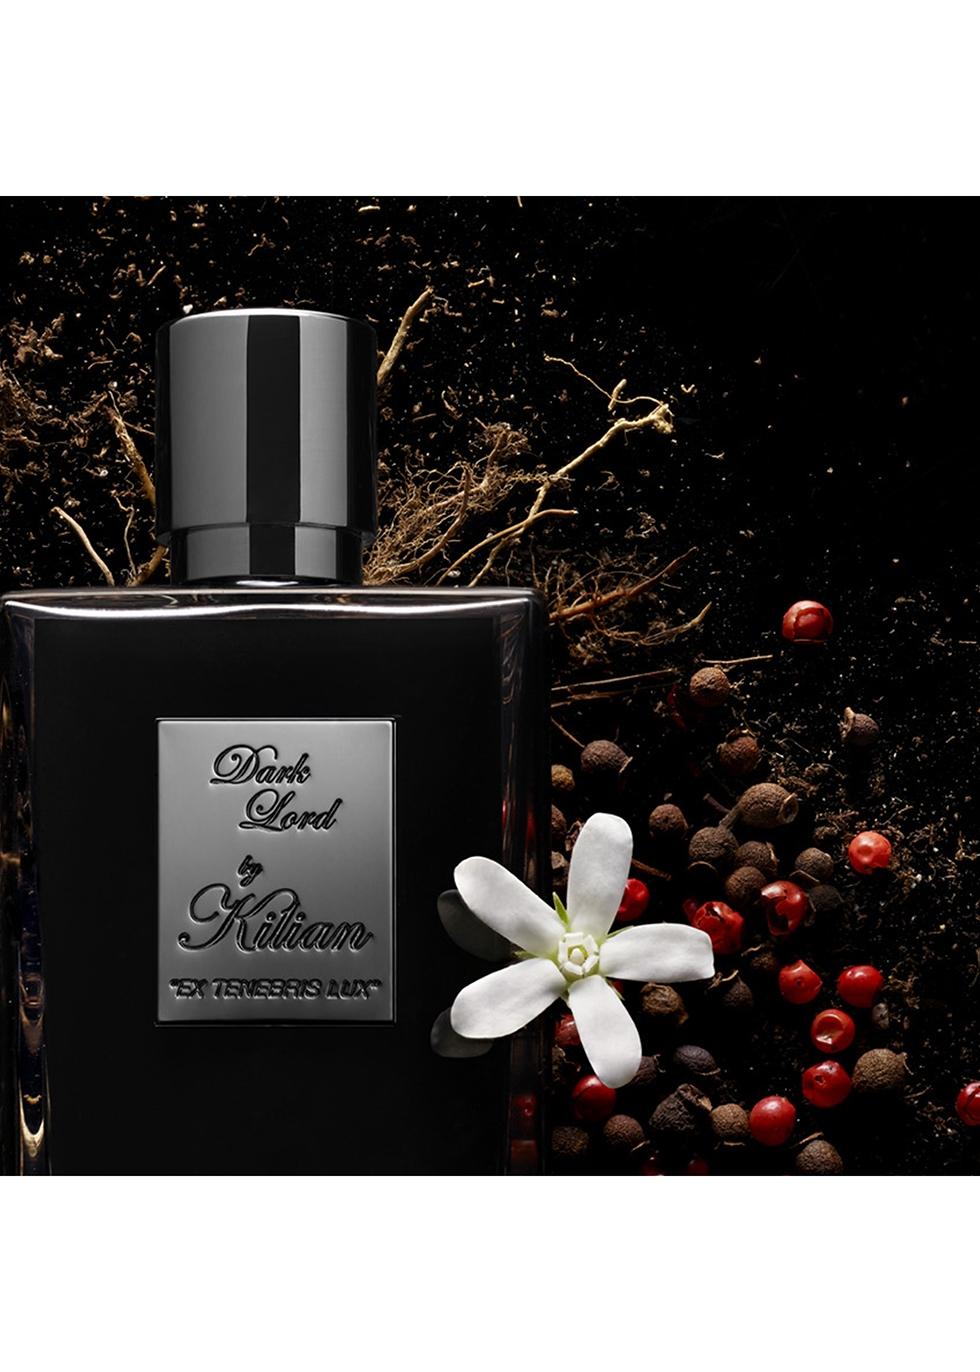 Dark Lord 'Ex Tenebris Lux' Eau De Parfum 50ml - Kilian